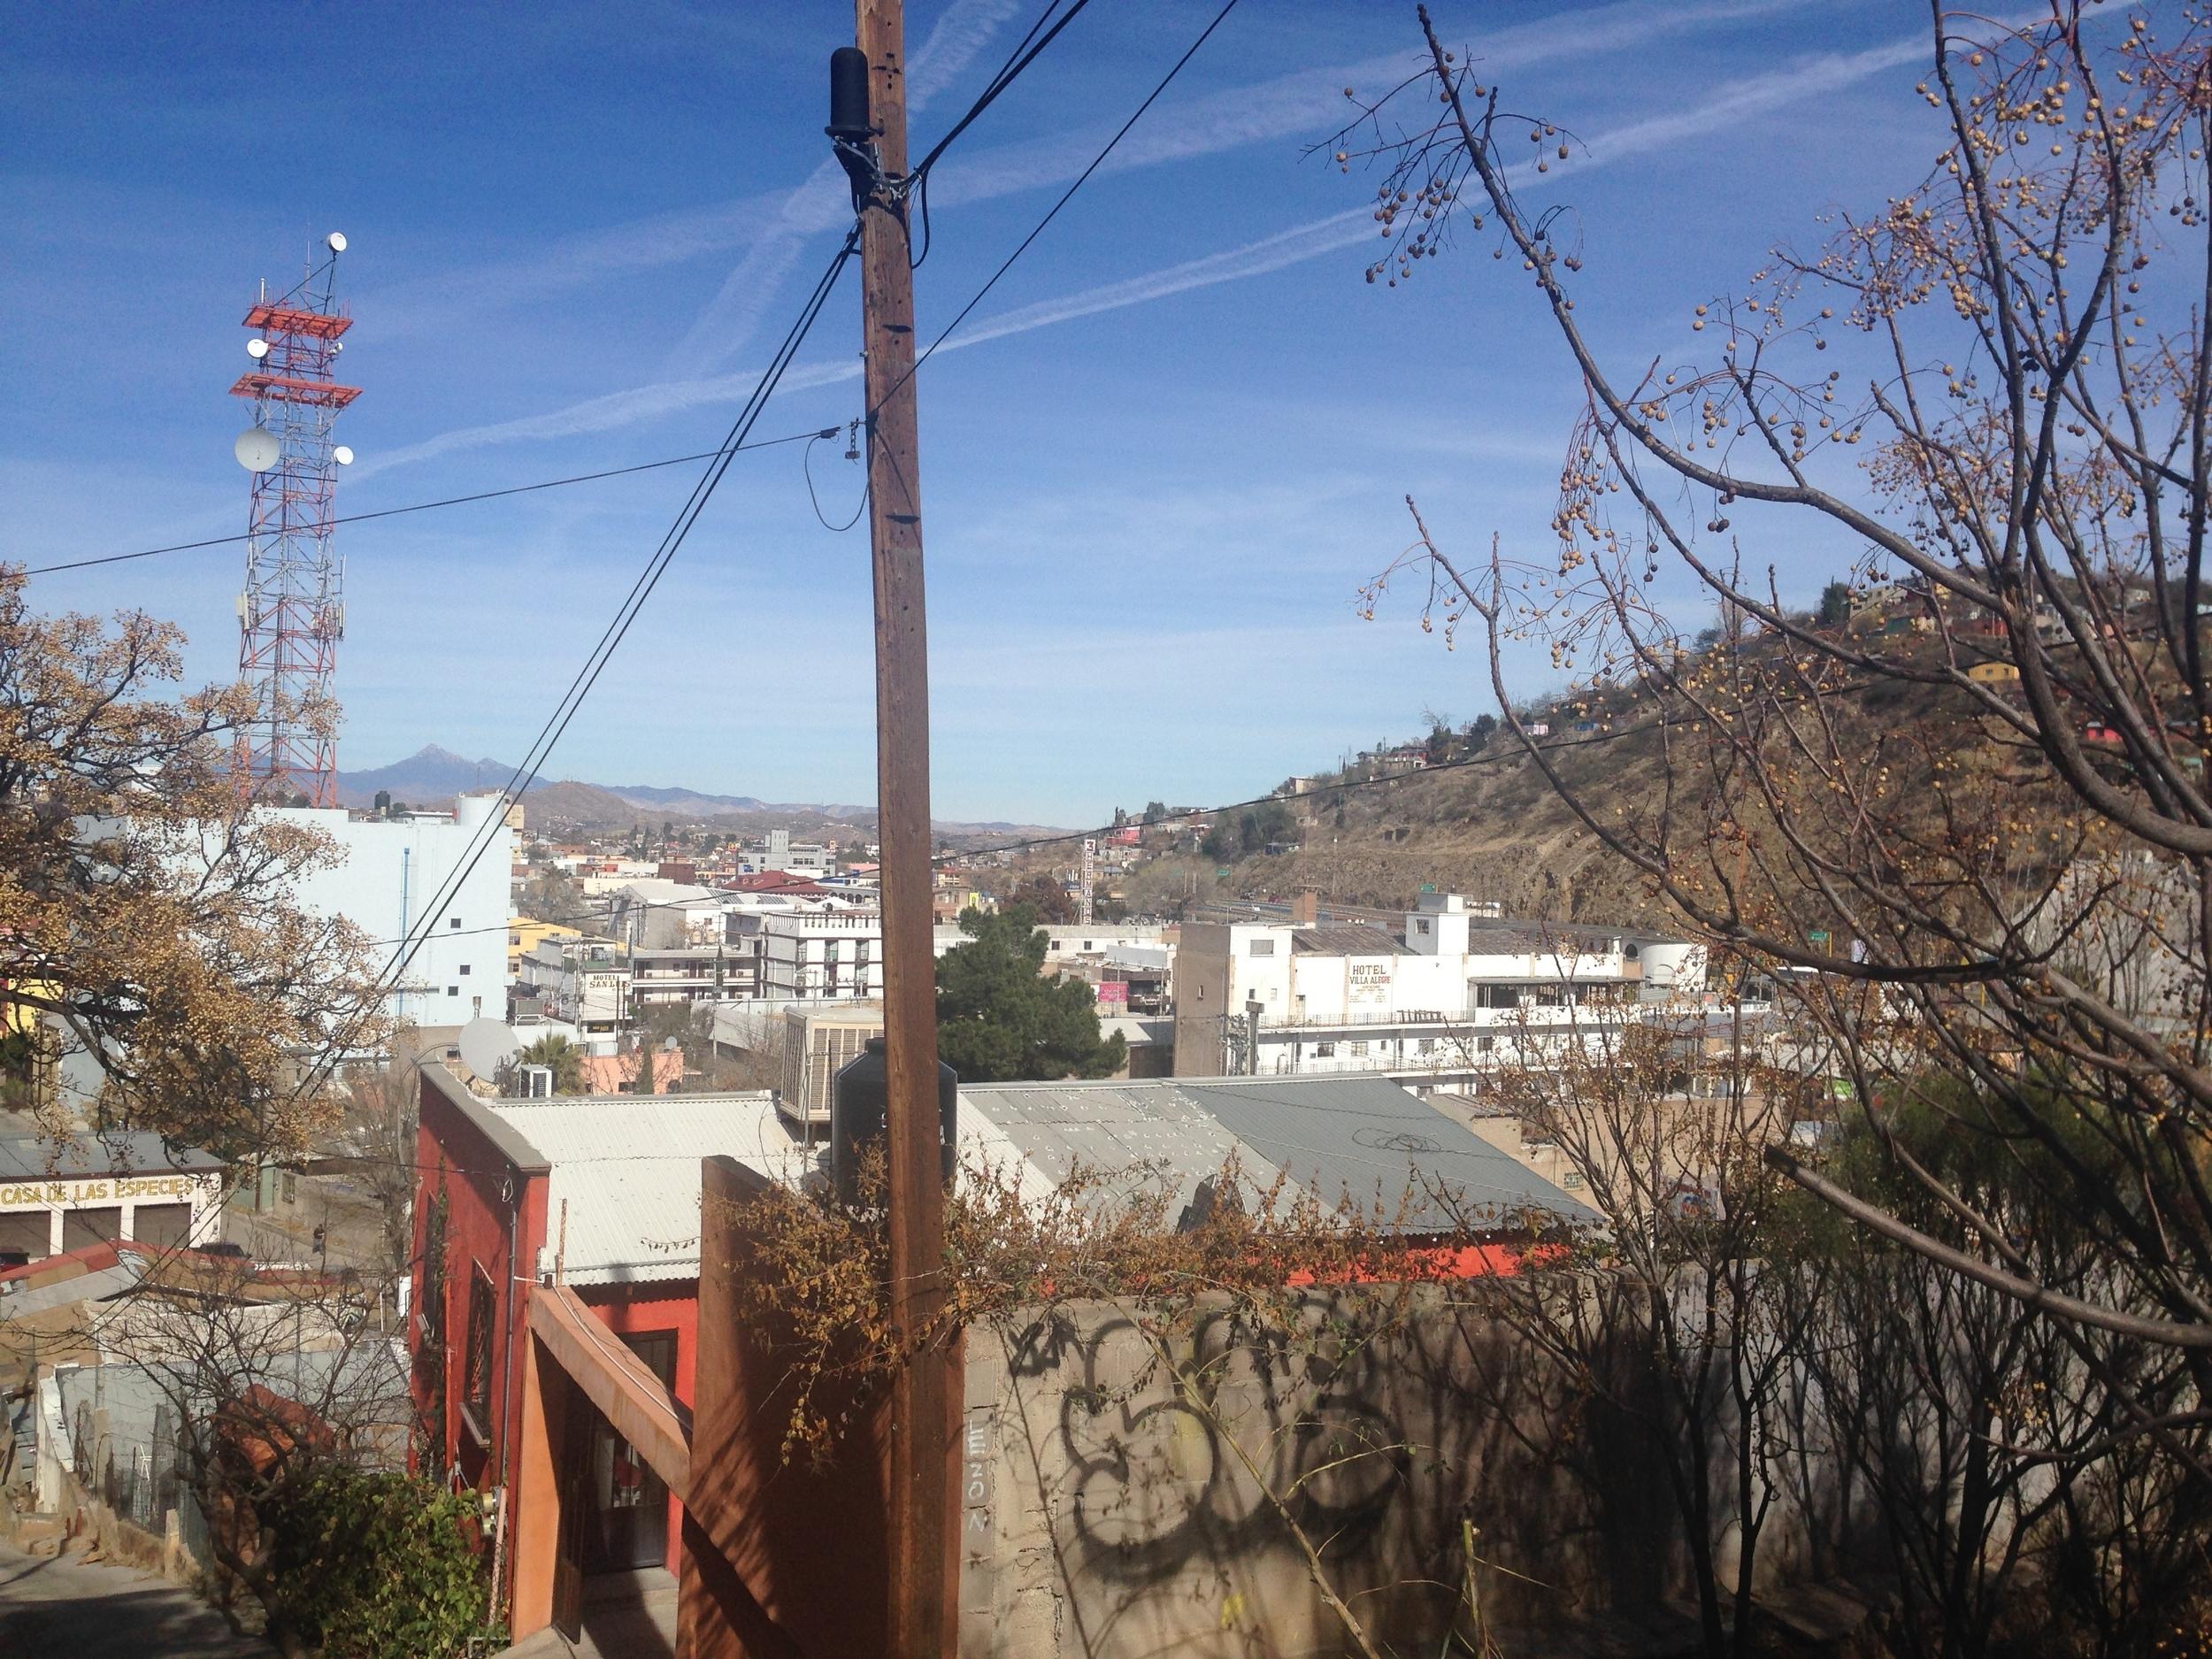 A view of Nogales from Gloria de la Rosa's neighborhood